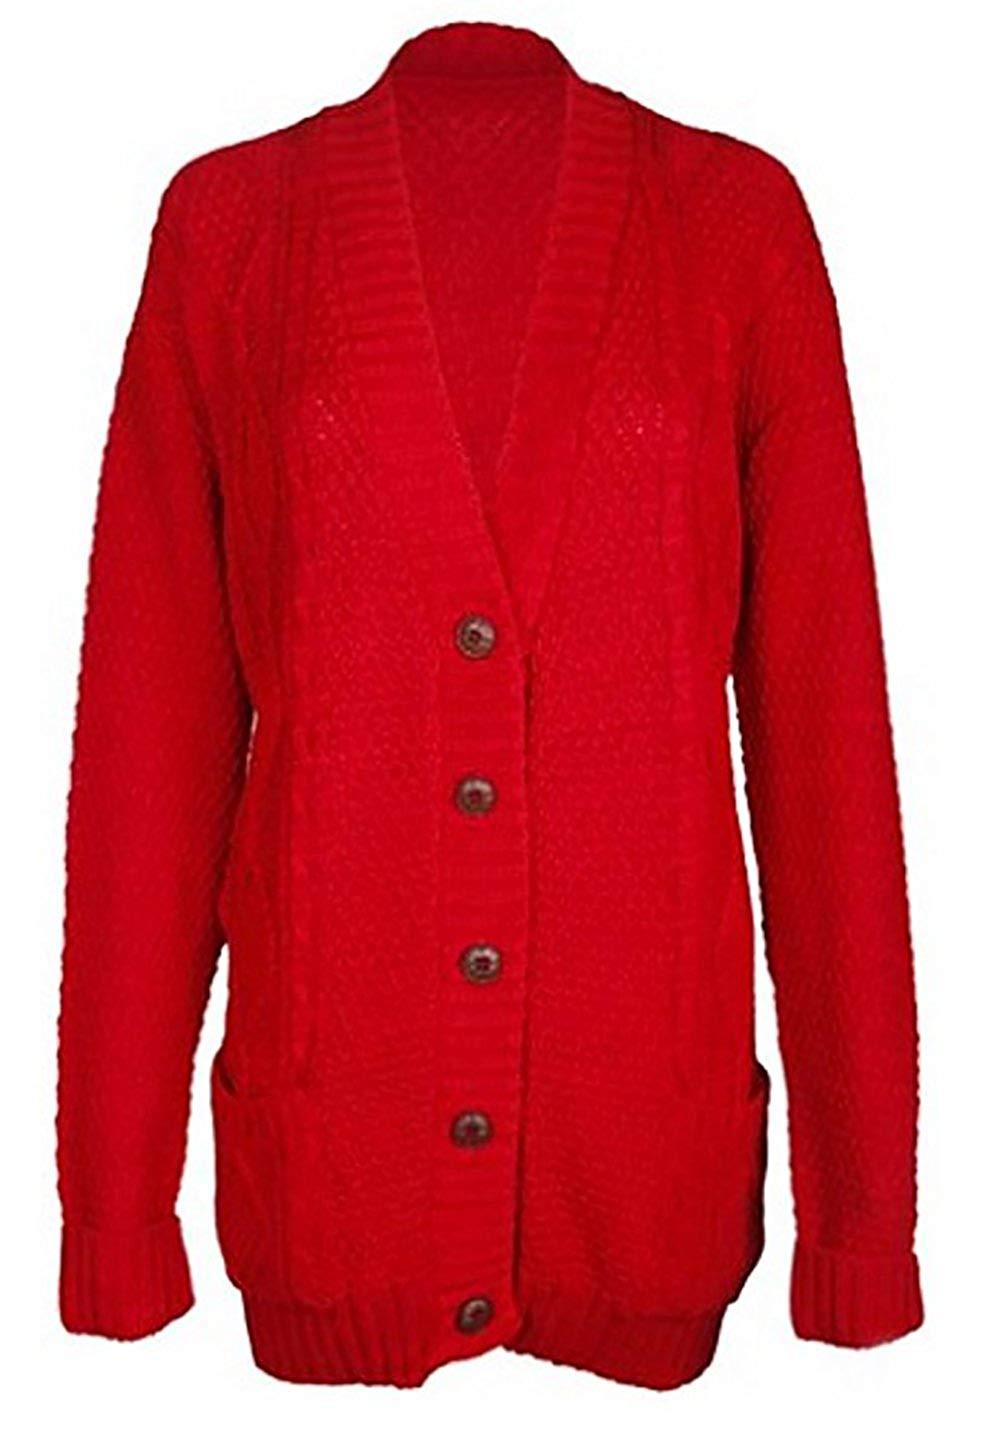 848a9cc563d2 ... Grandad Boyfriend Pocket Button up Top Cardigan. Women s Ladies Long  Sleeve Pocket Cable Knit Chunky Cardigan Size 6-24